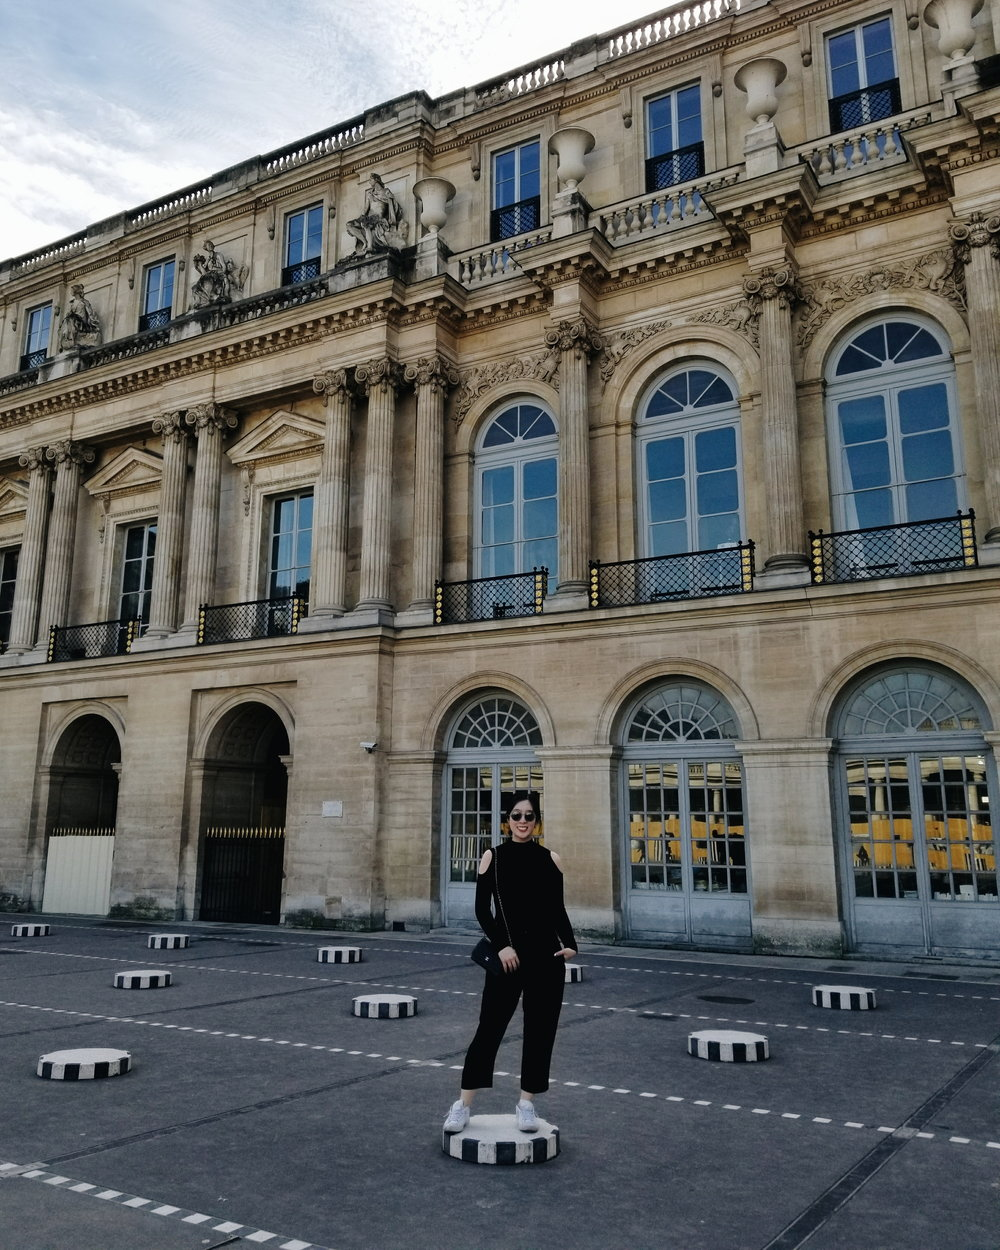 postcards-from-paris-palais-de-royal-04.jpg